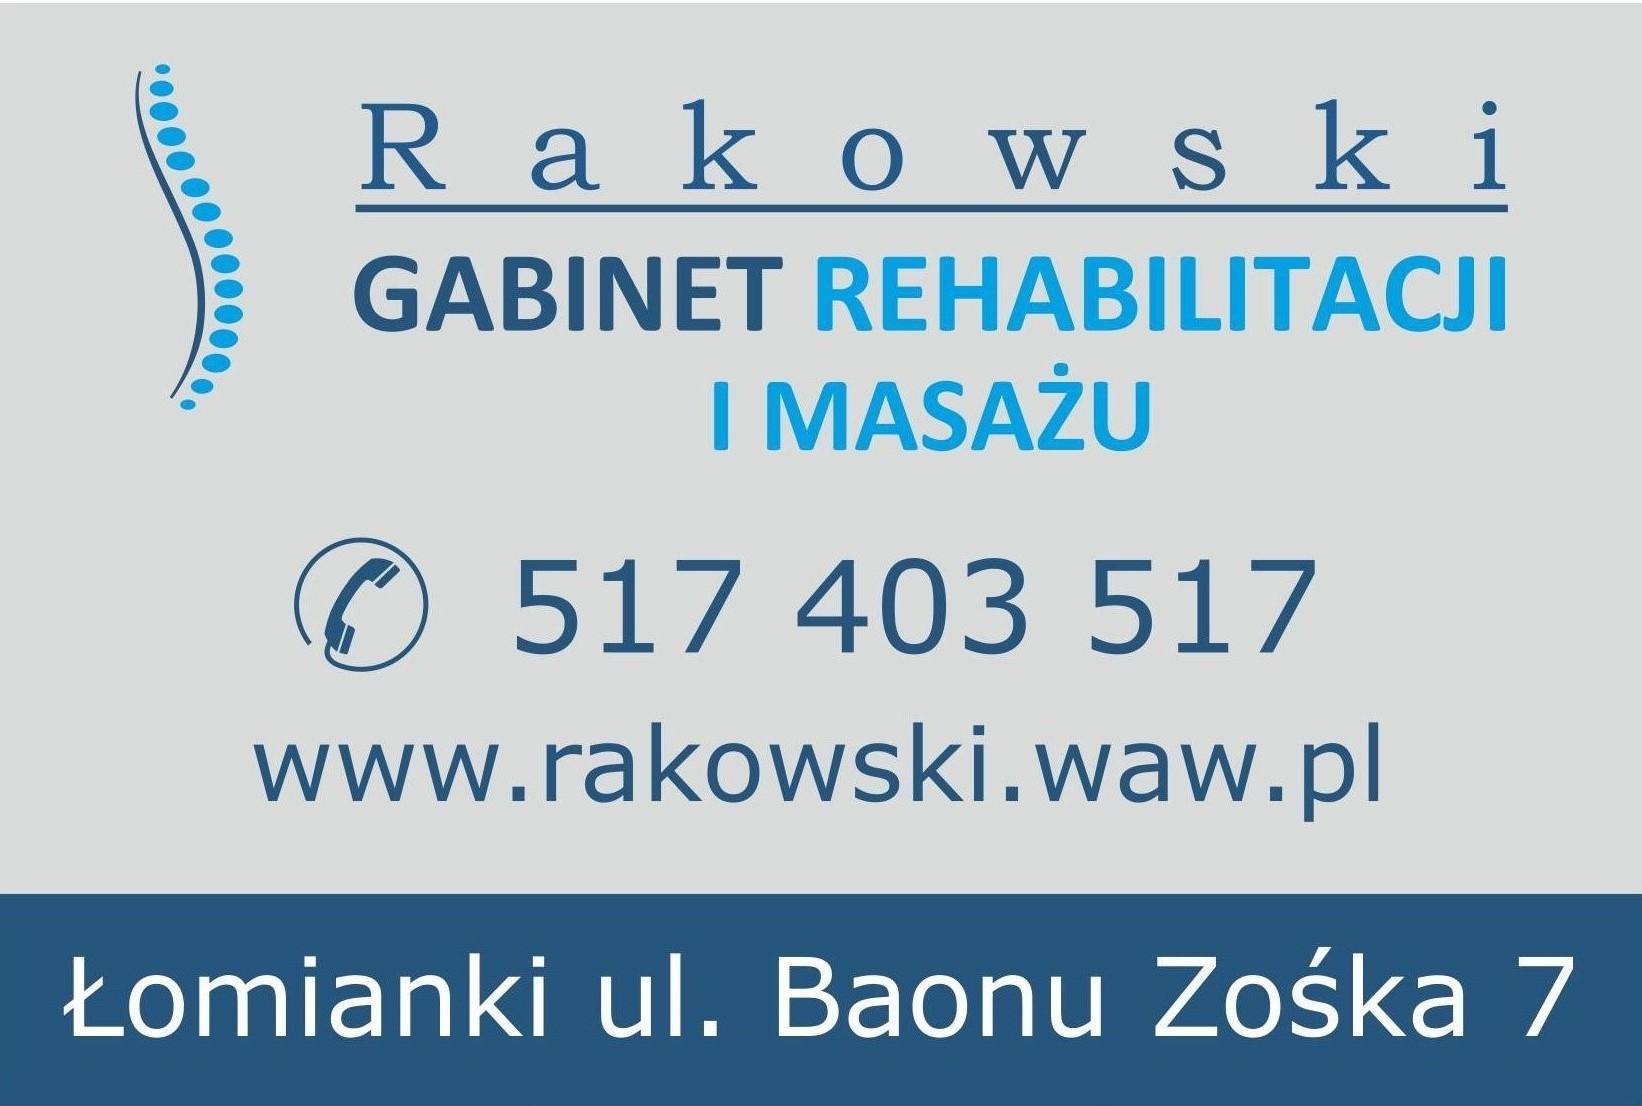 Rehabilitacja Rakowski